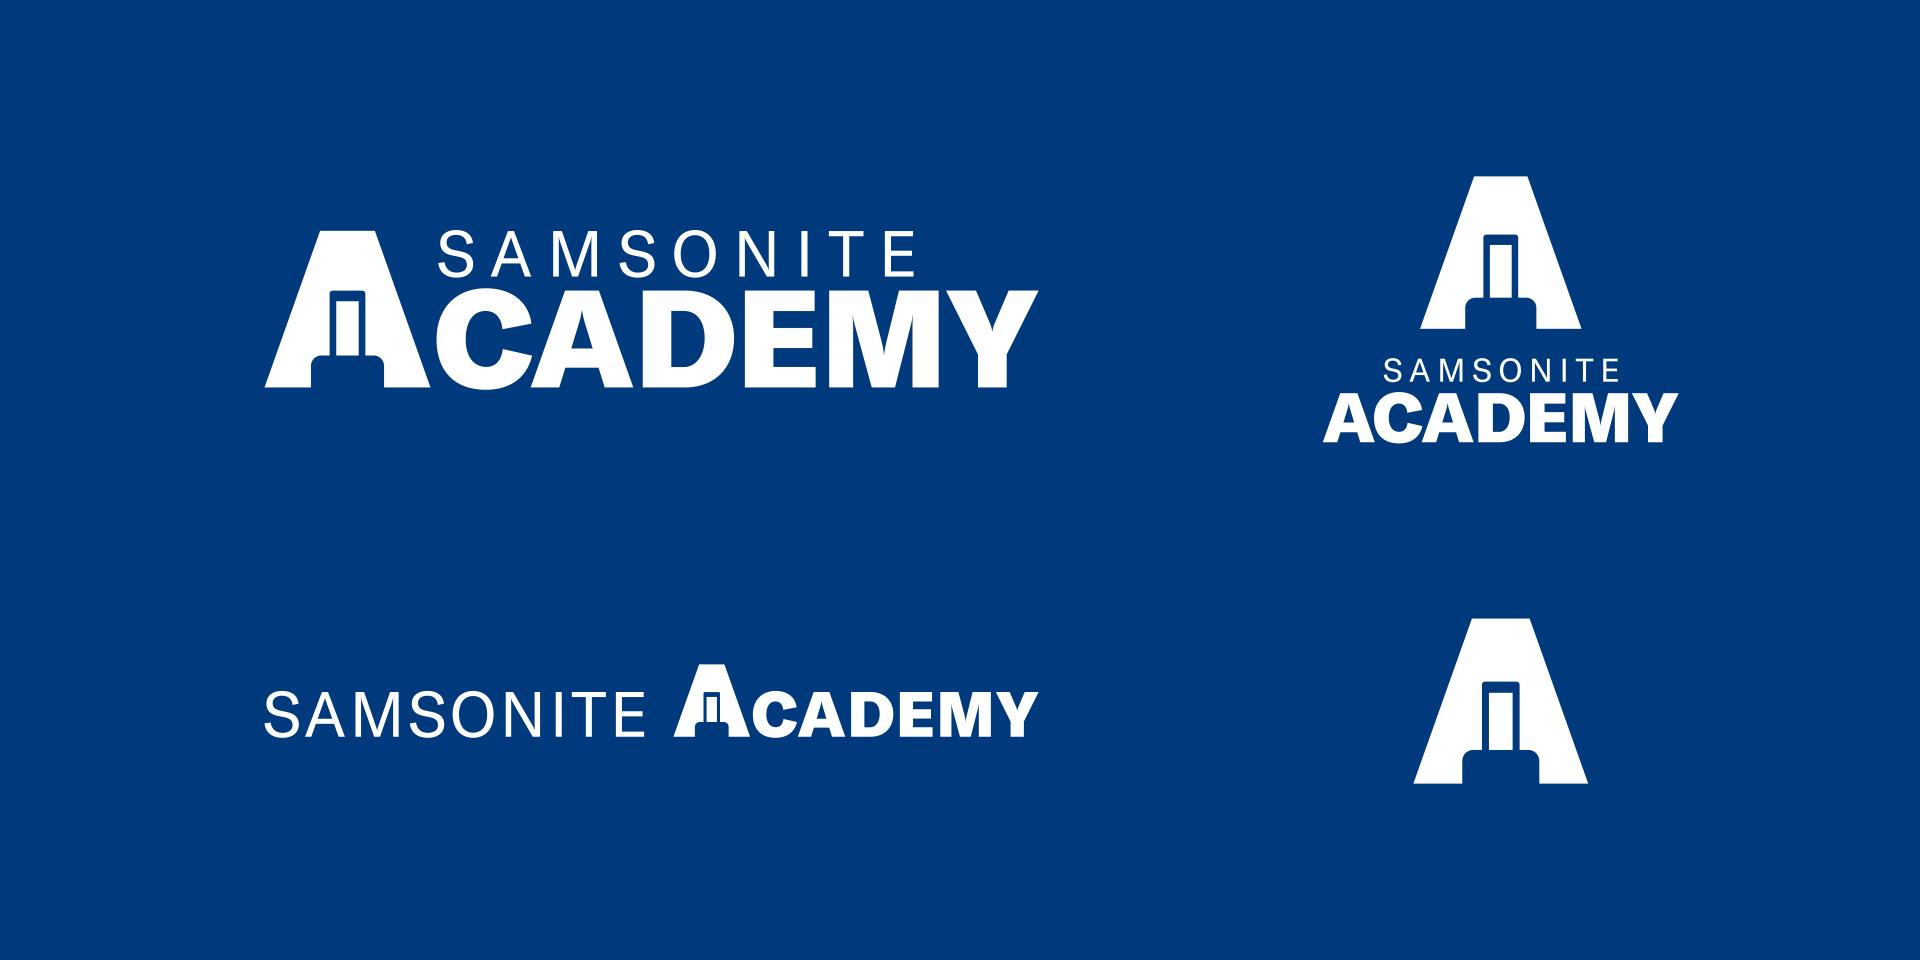 Samsonite Academy logo on blue